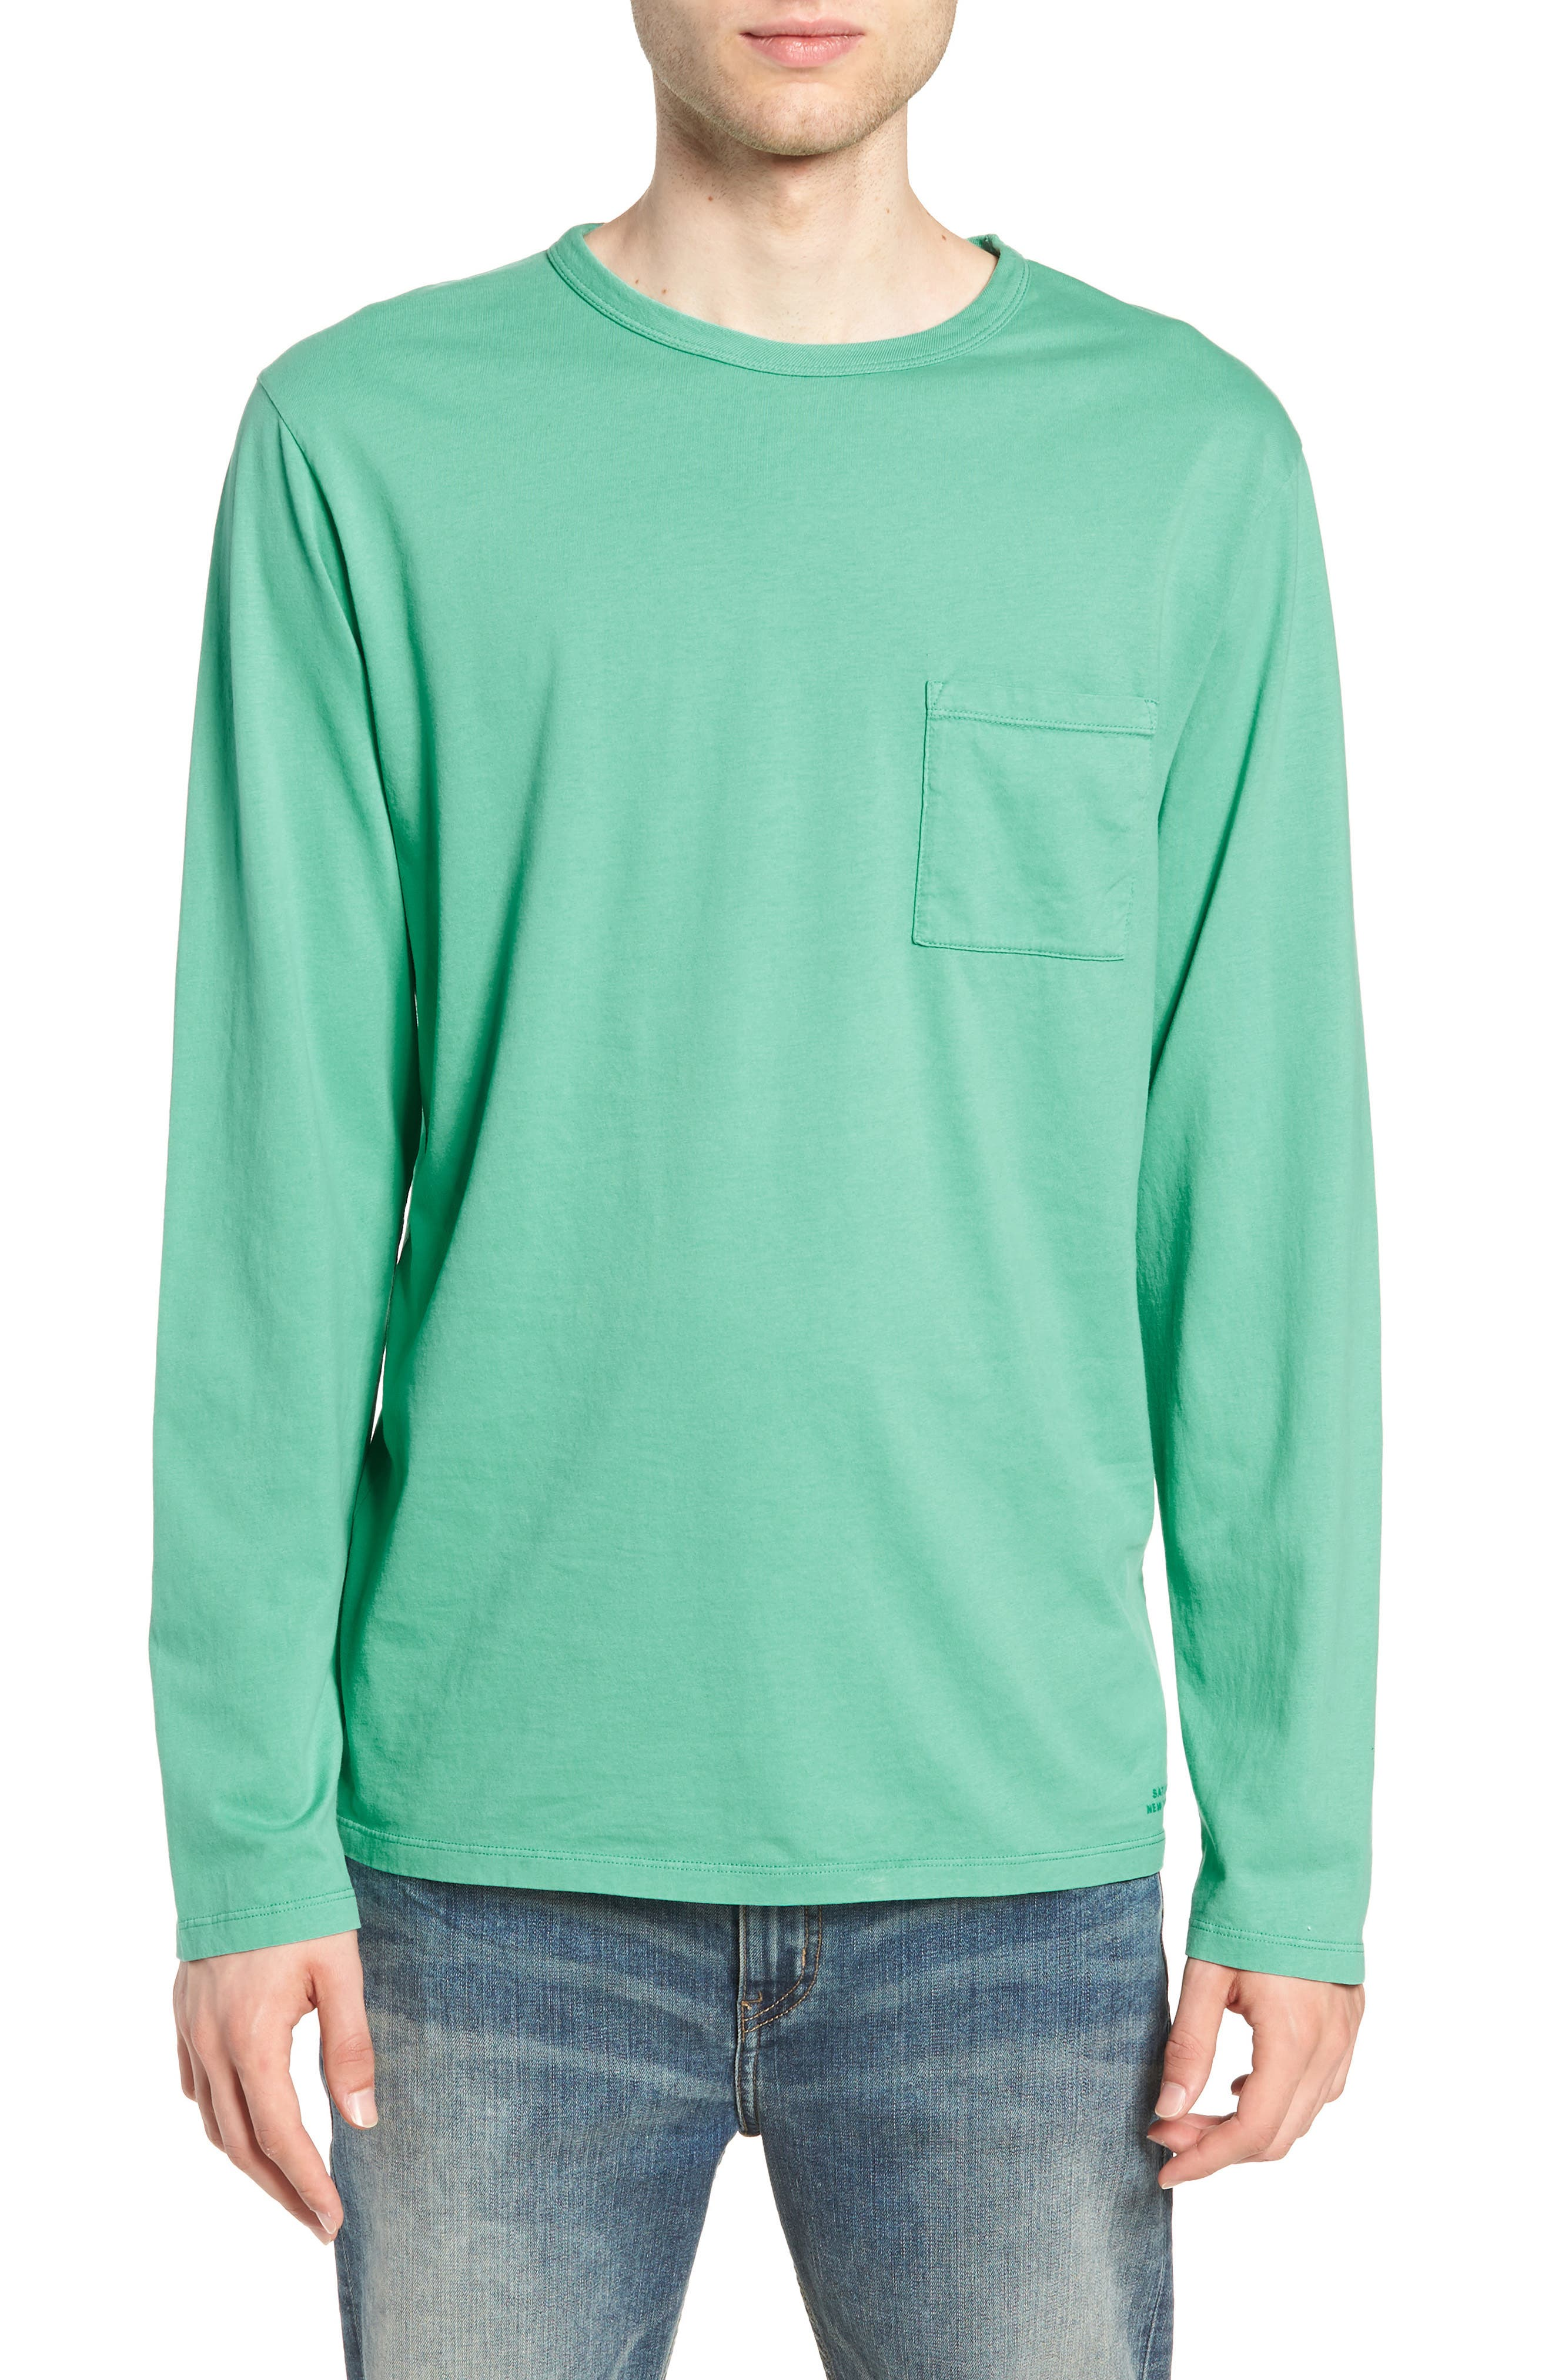 James Pima Long Sleeve Pocket T-Shirt,                         Main,                         color, SEAFOAM GREEN